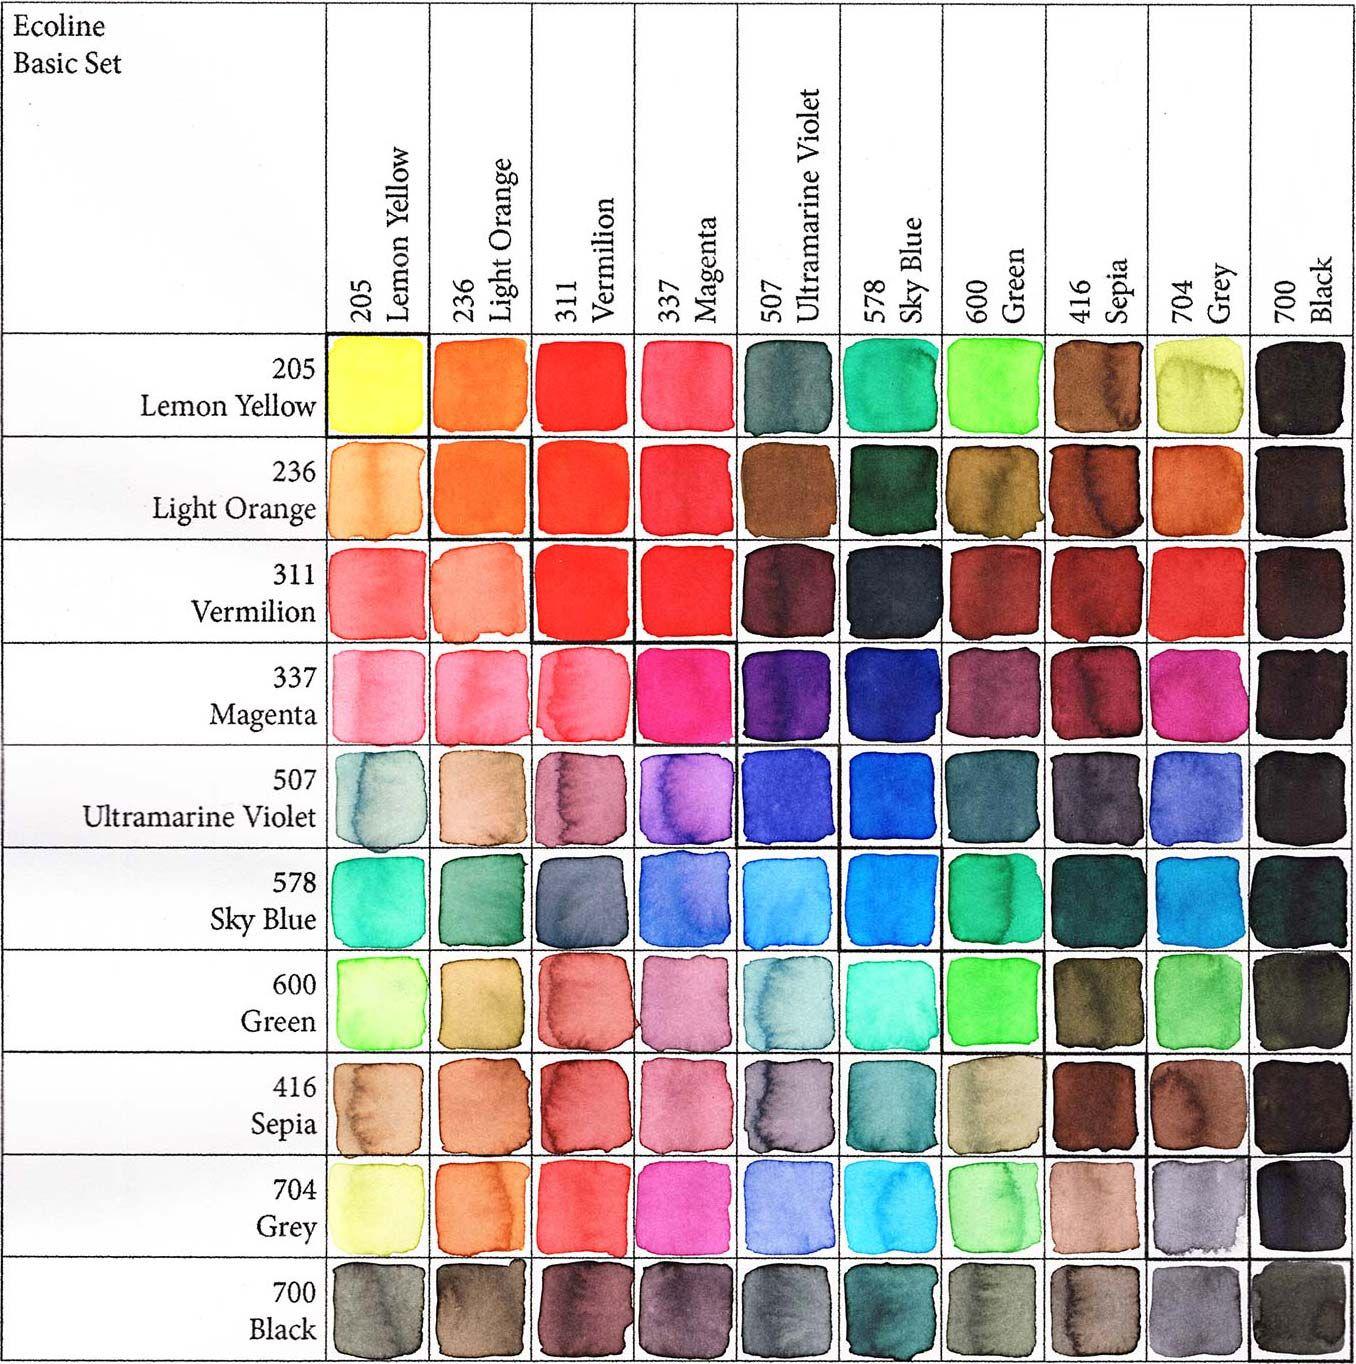 Ecoline Acuarela Liquida Paleta De Colores Farbkarten